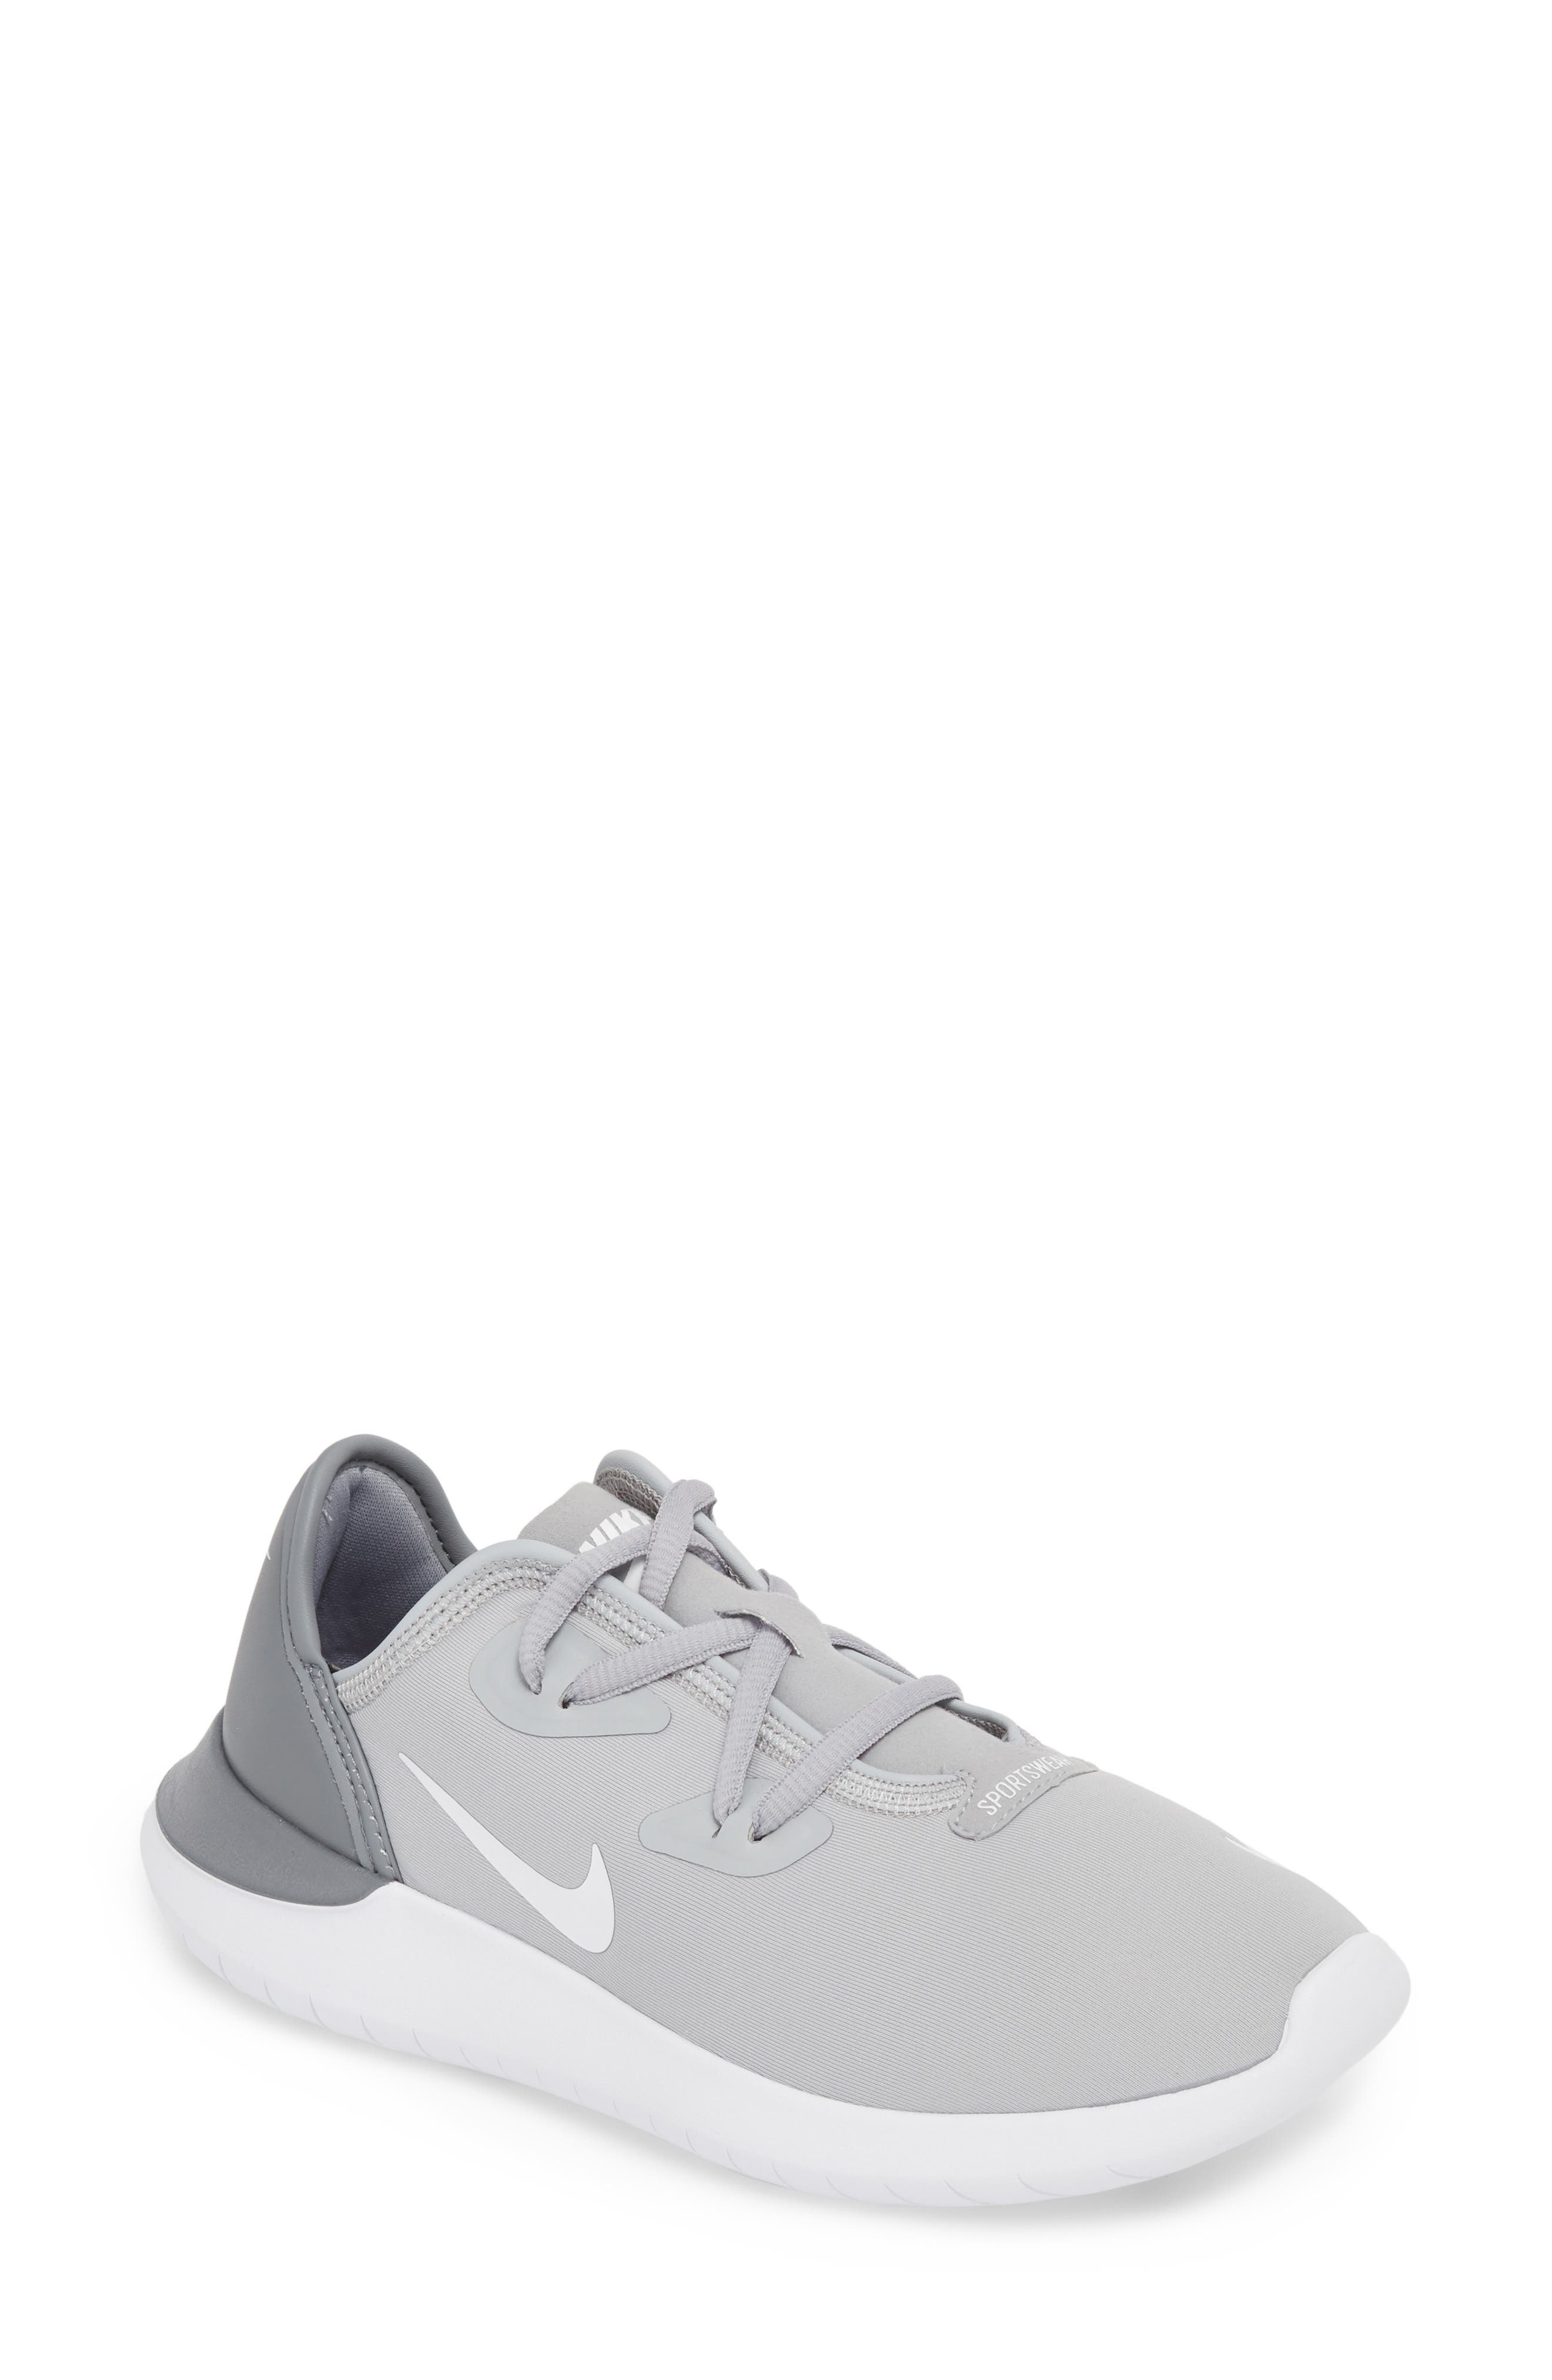 Hakata Sneaker,                         Main,                         color, Wolf Grey/ White